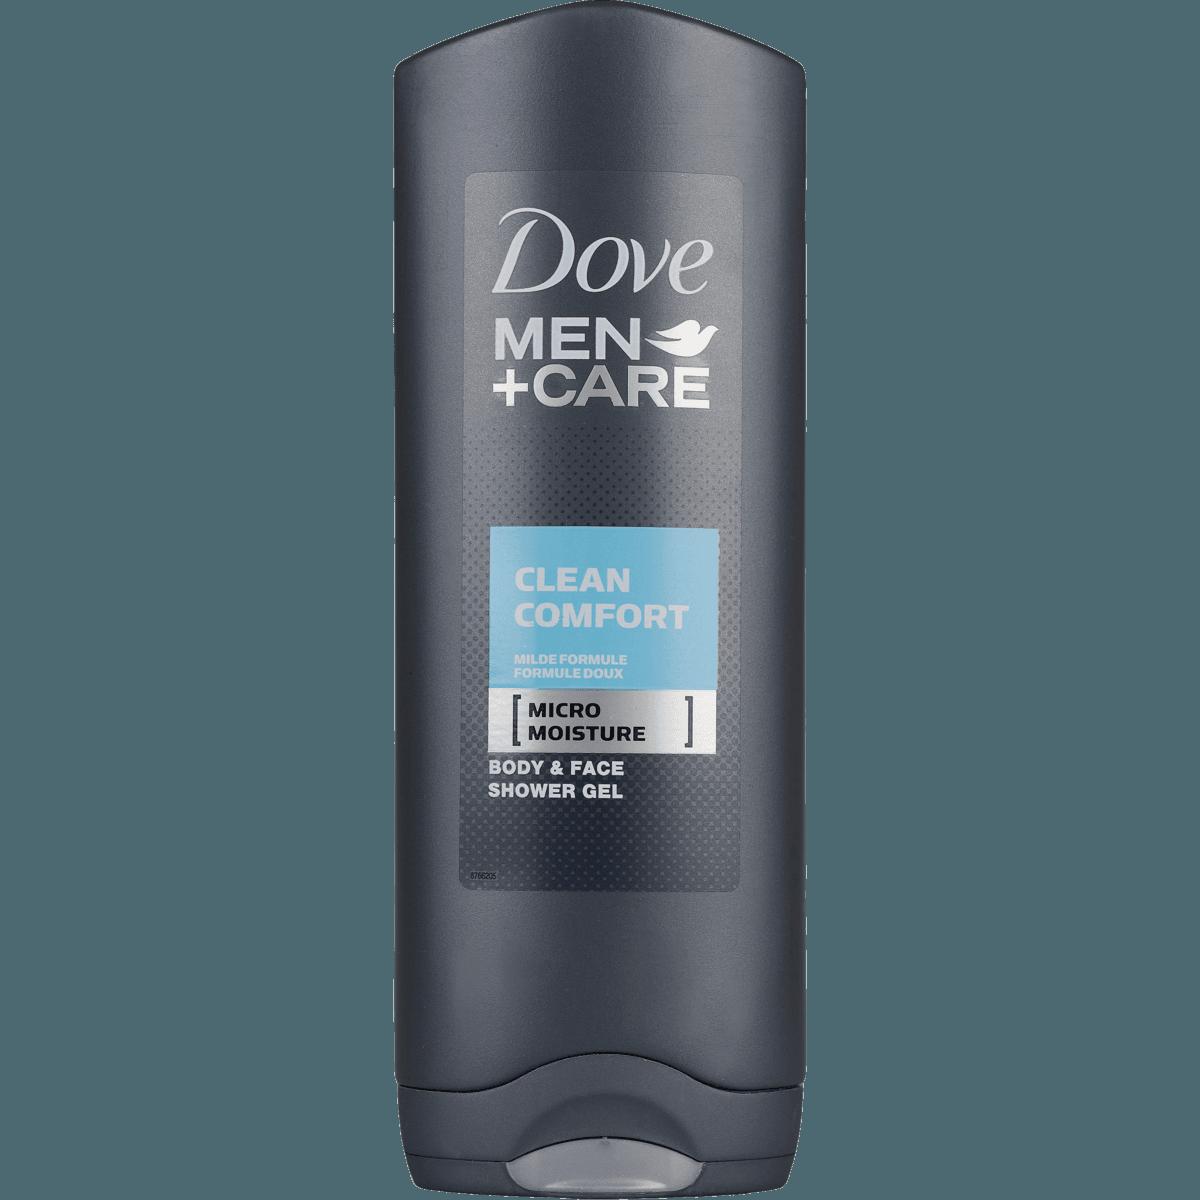 Mencare Comfort Shower Clean Dove Geldove Men Care Clean Comfort Shower Gel Dove Men Care Clean Comfort Shower Geldove Men C Shower Gel Dove Men Care Gel